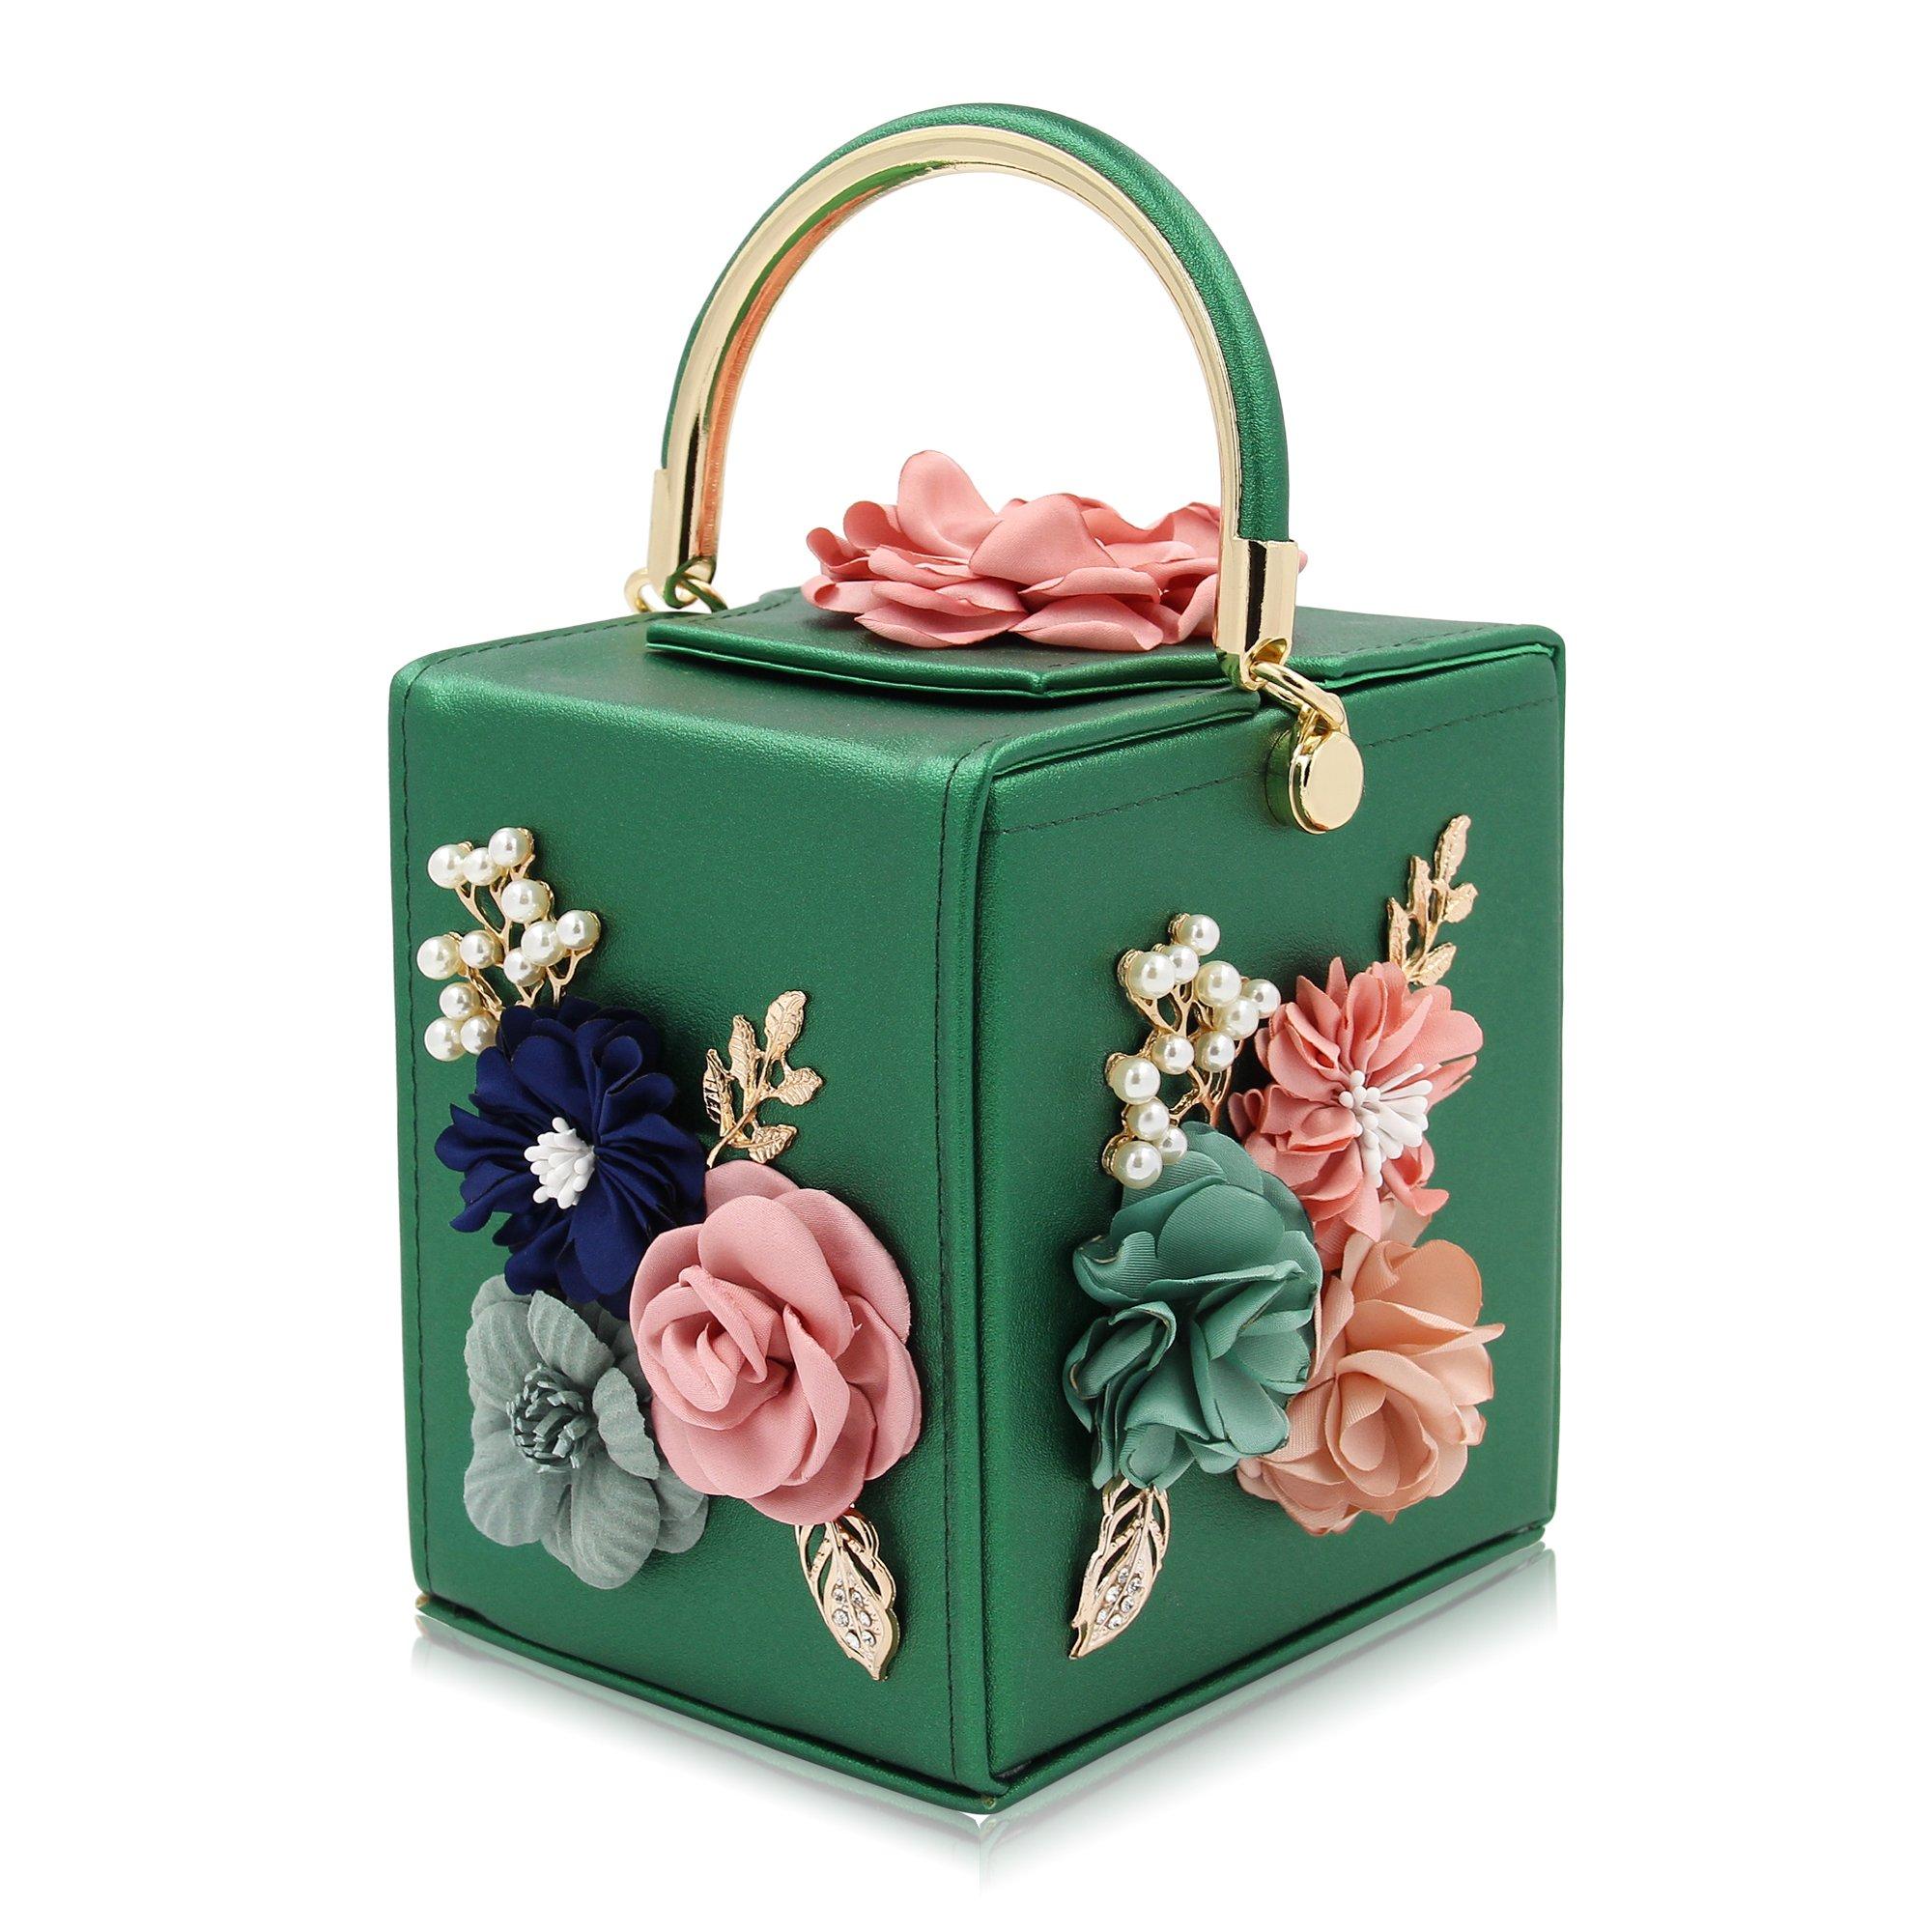 Milisente Women Clutches Flower Clutch Bag Box Clutch Purse Evening Handbag (Green)